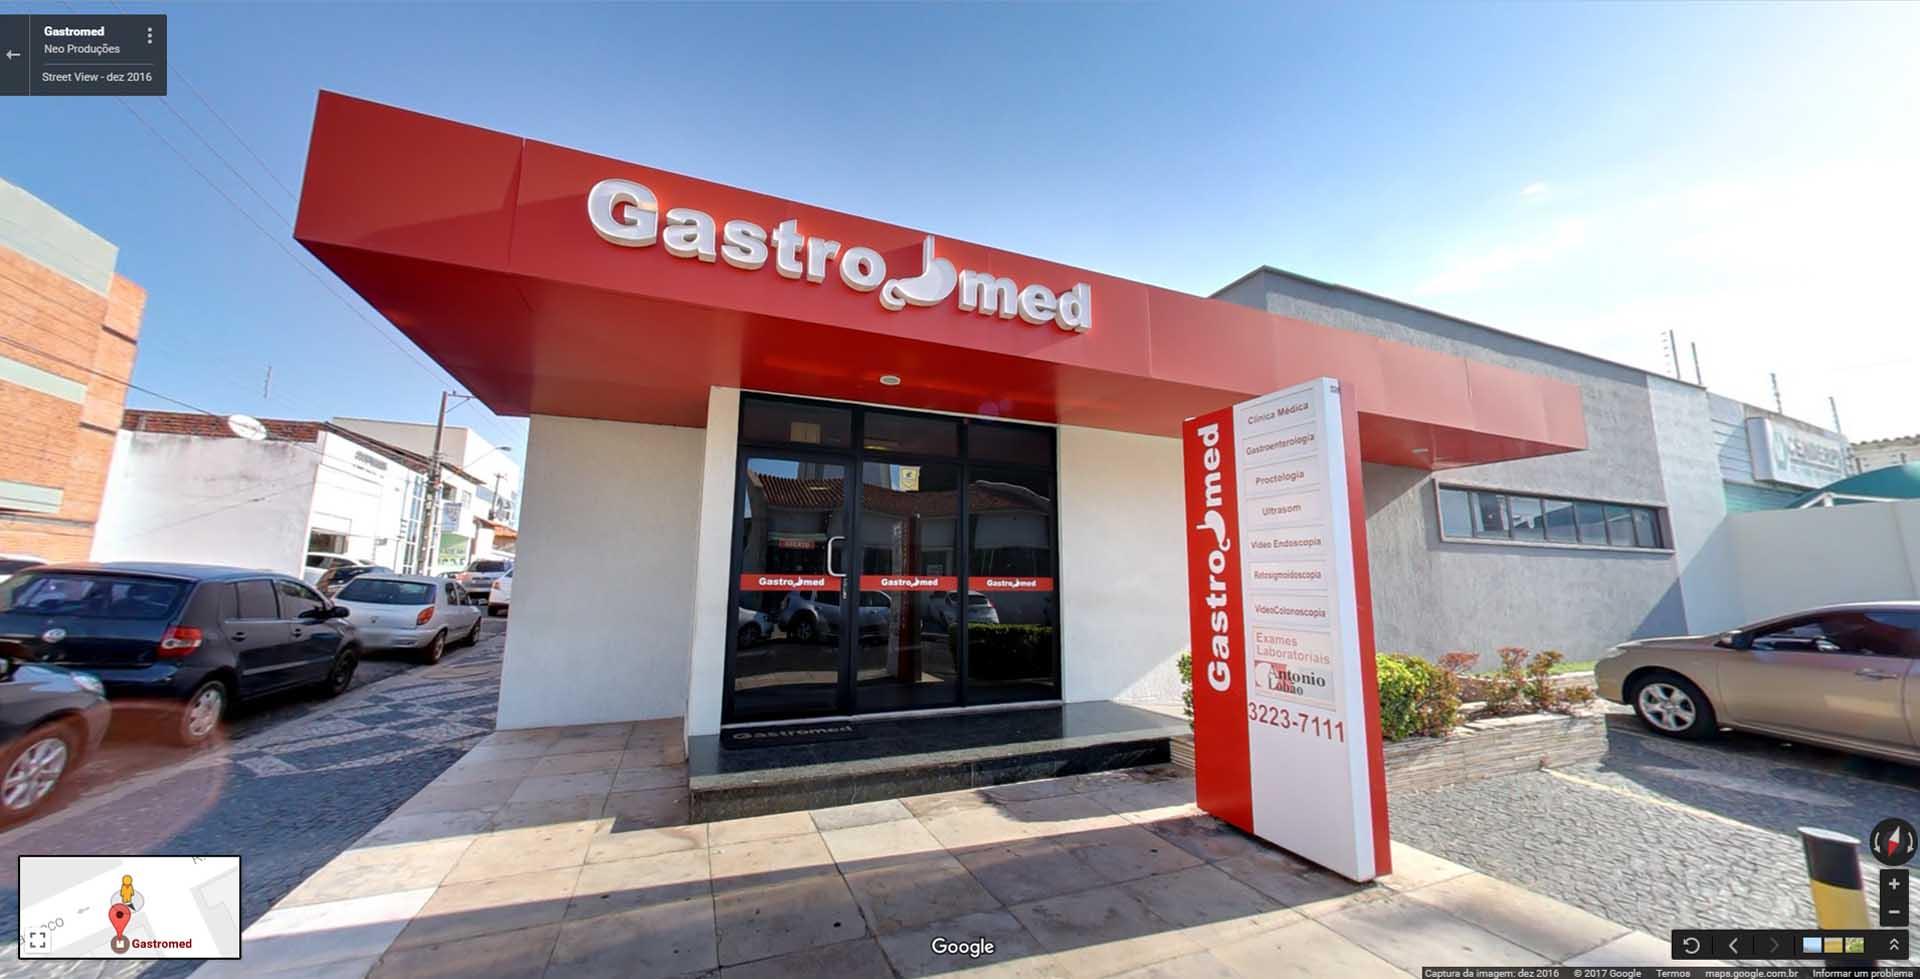 Gastromed